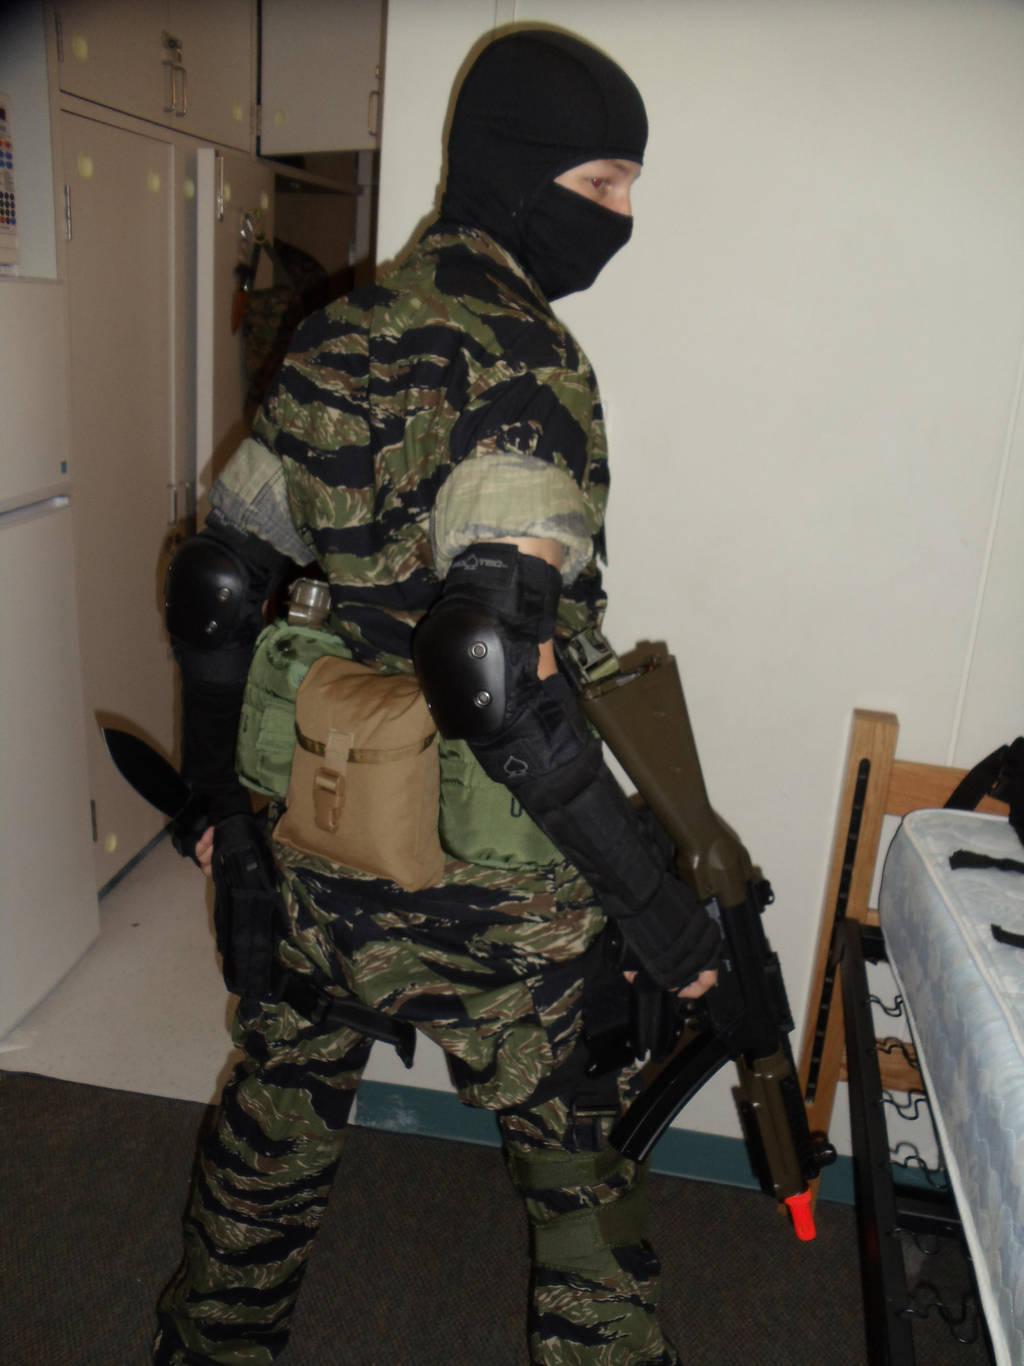 Metal Gear Solid Msf Soldier 2 By Streaked Silver On Deviantart